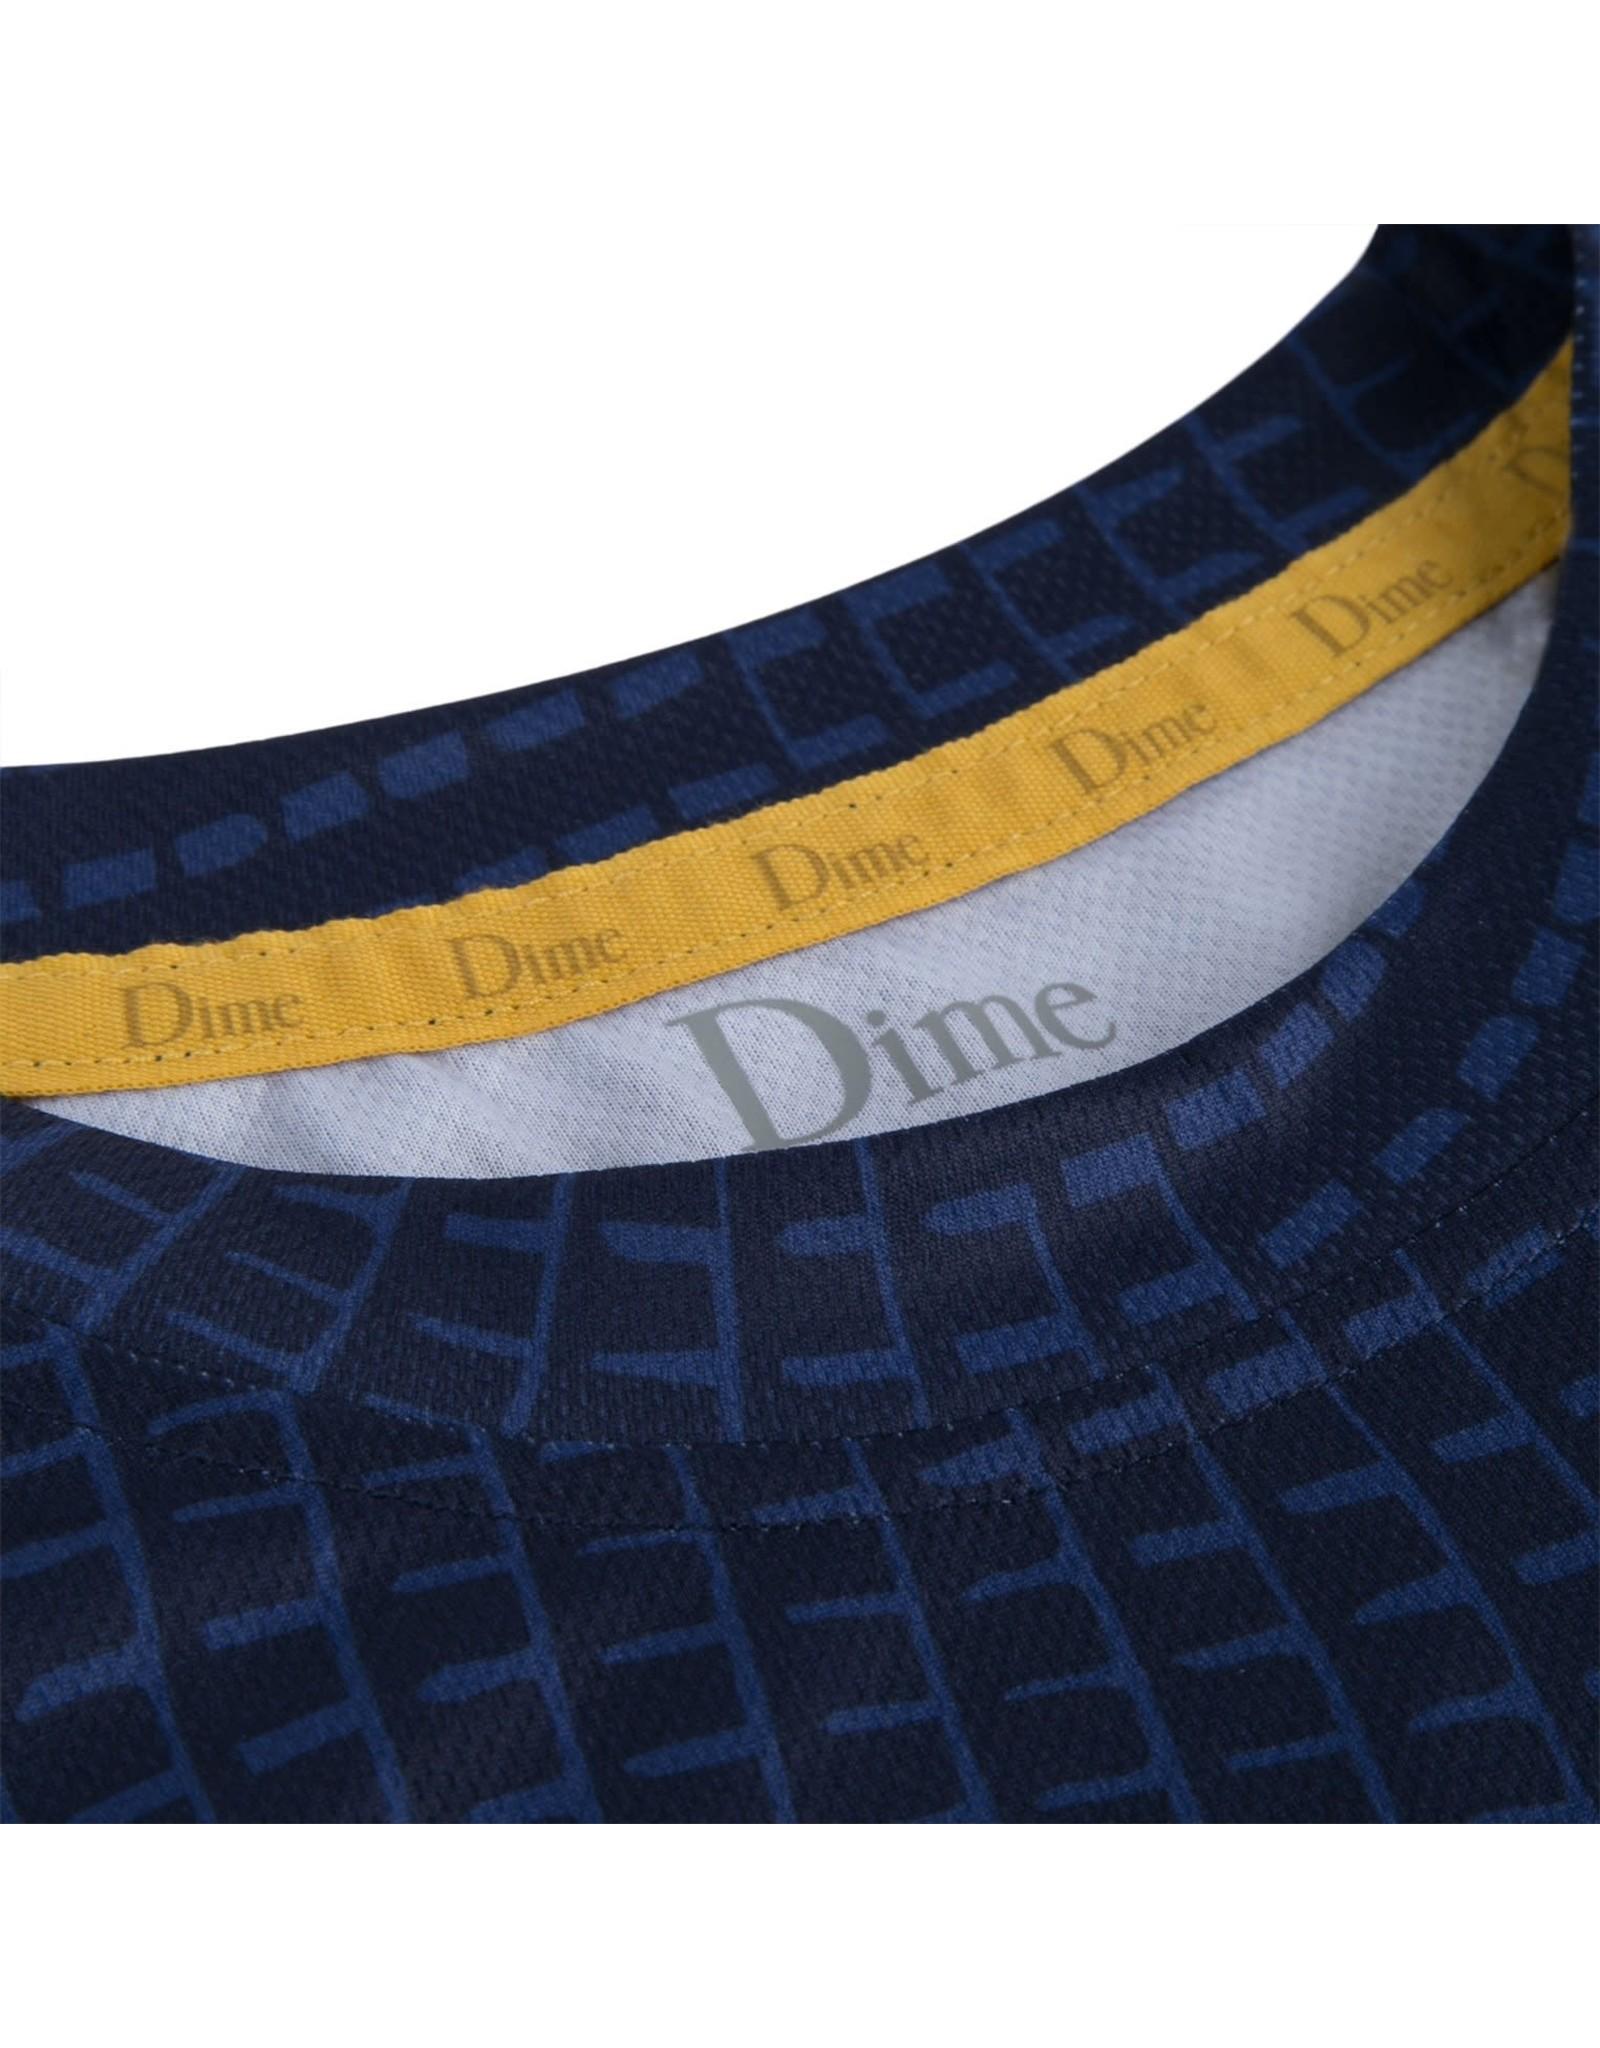 Dime Warp Sports T-Shirt - Blue